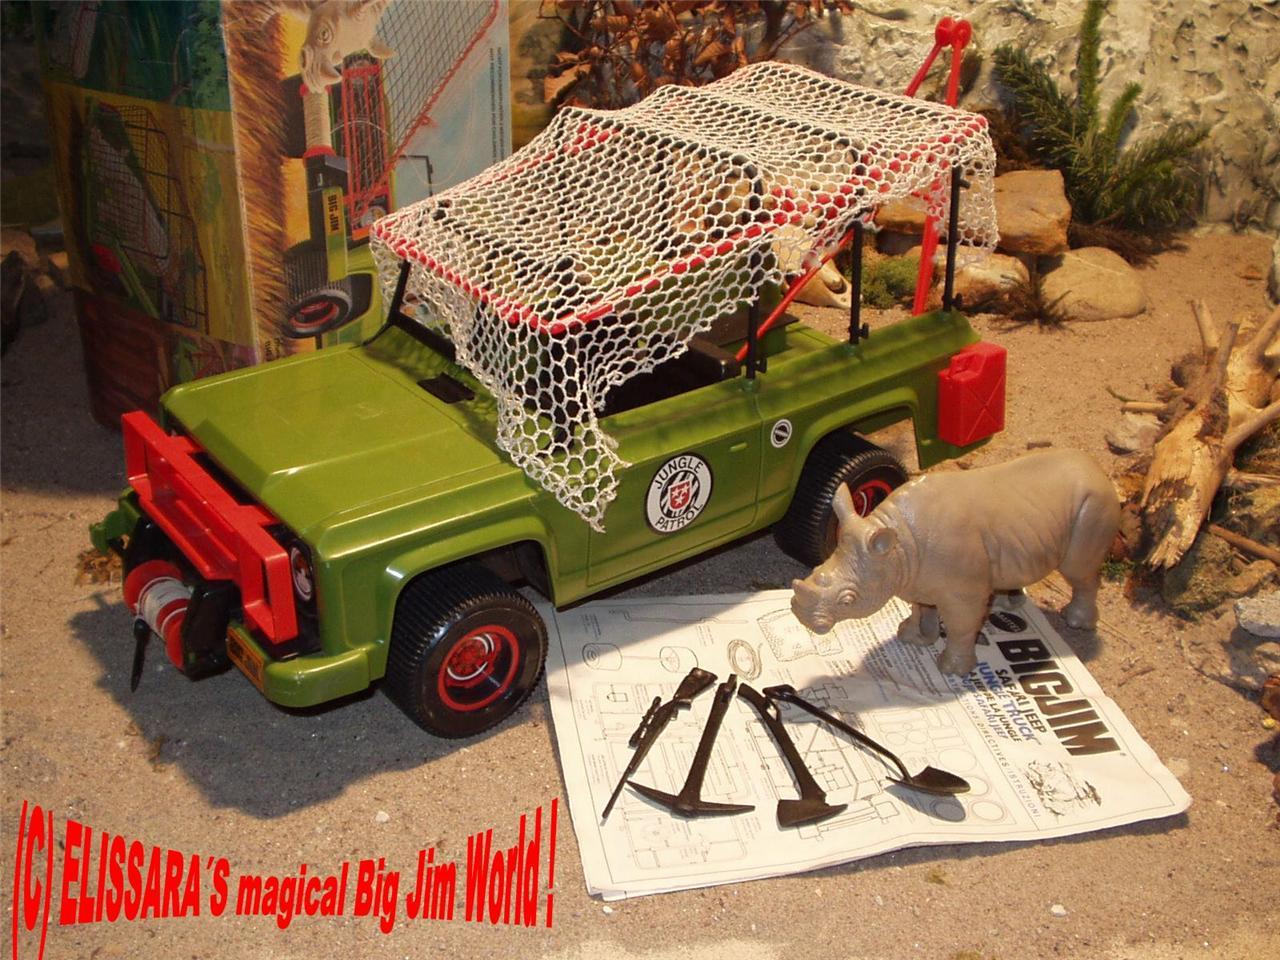 big jim safari jeep jungle truck rhino accessories. Black Bedroom Furniture Sets. Home Design Ideas